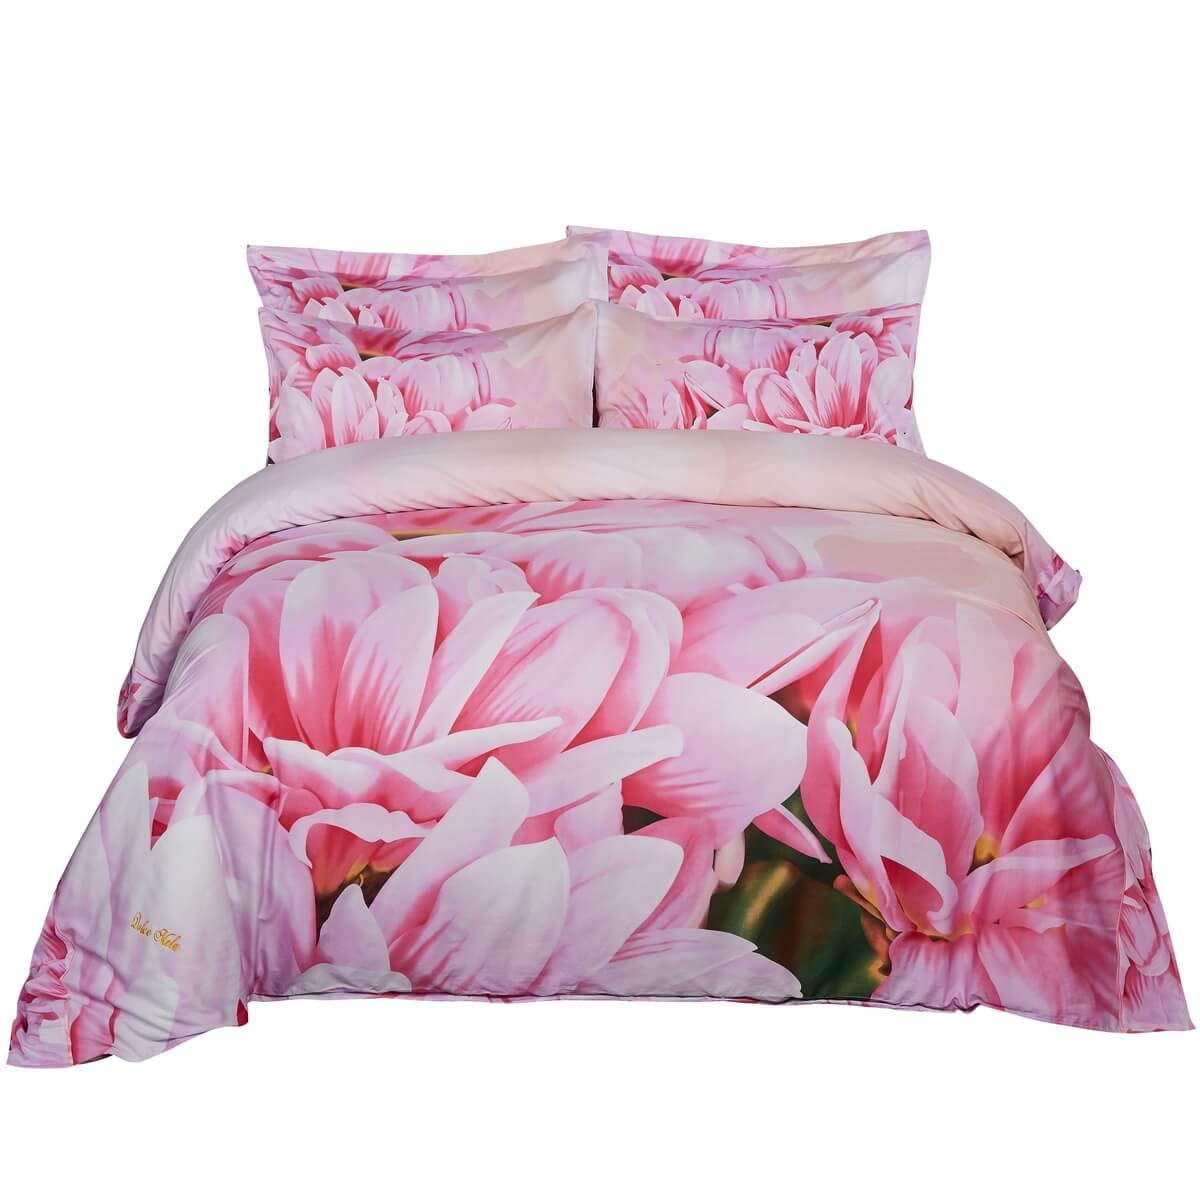 Dolce Mela DM701K Duvet Cover Set King Pink